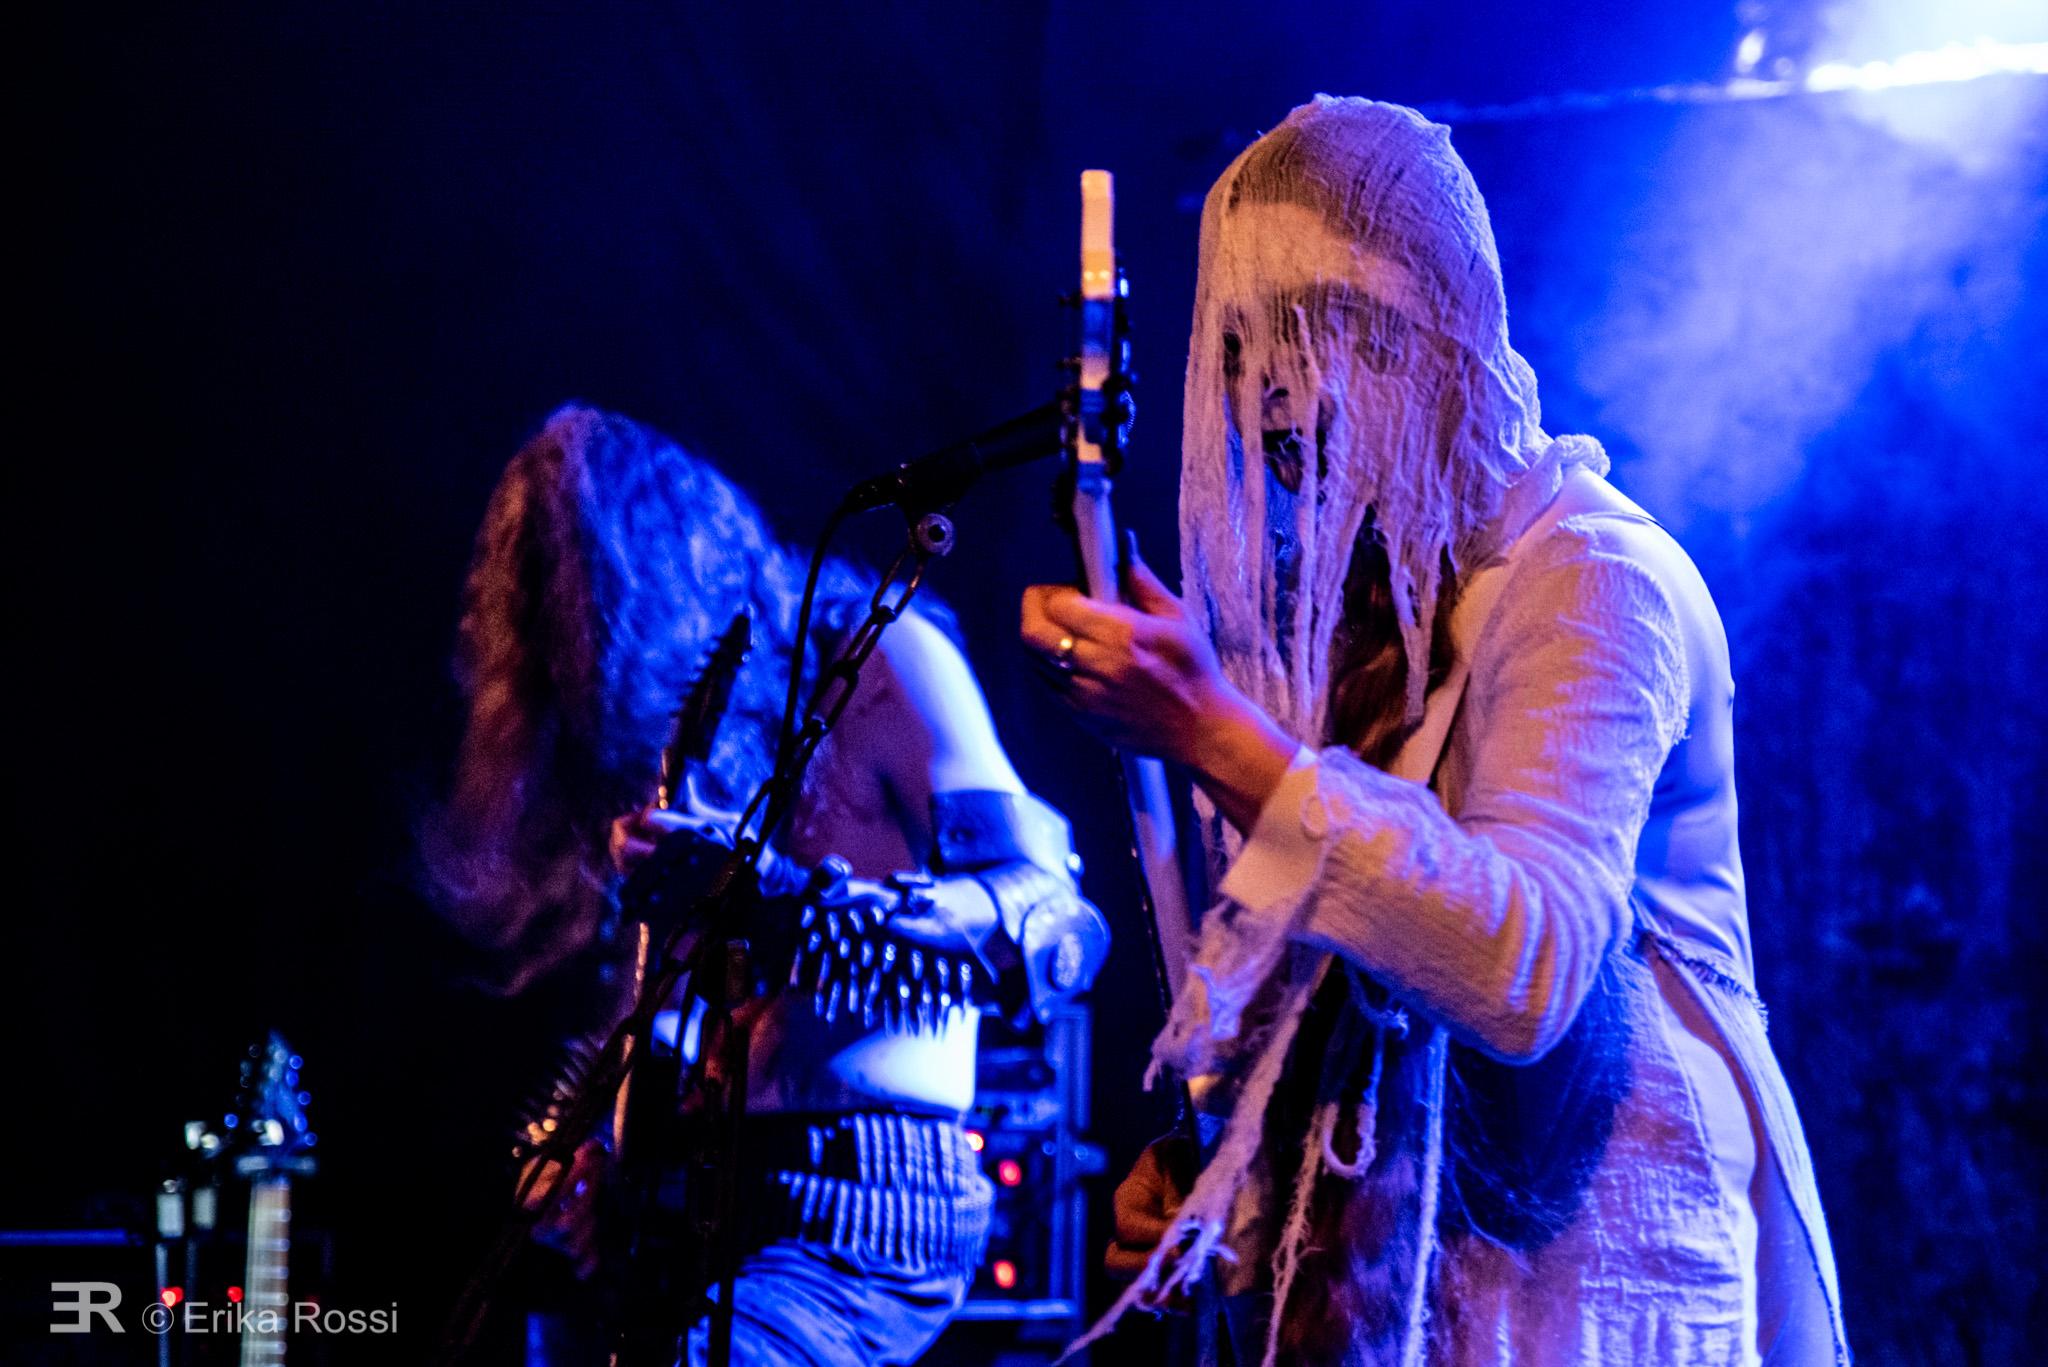 Darkened Nocturn Slaughtercult - Forest Fest 2019